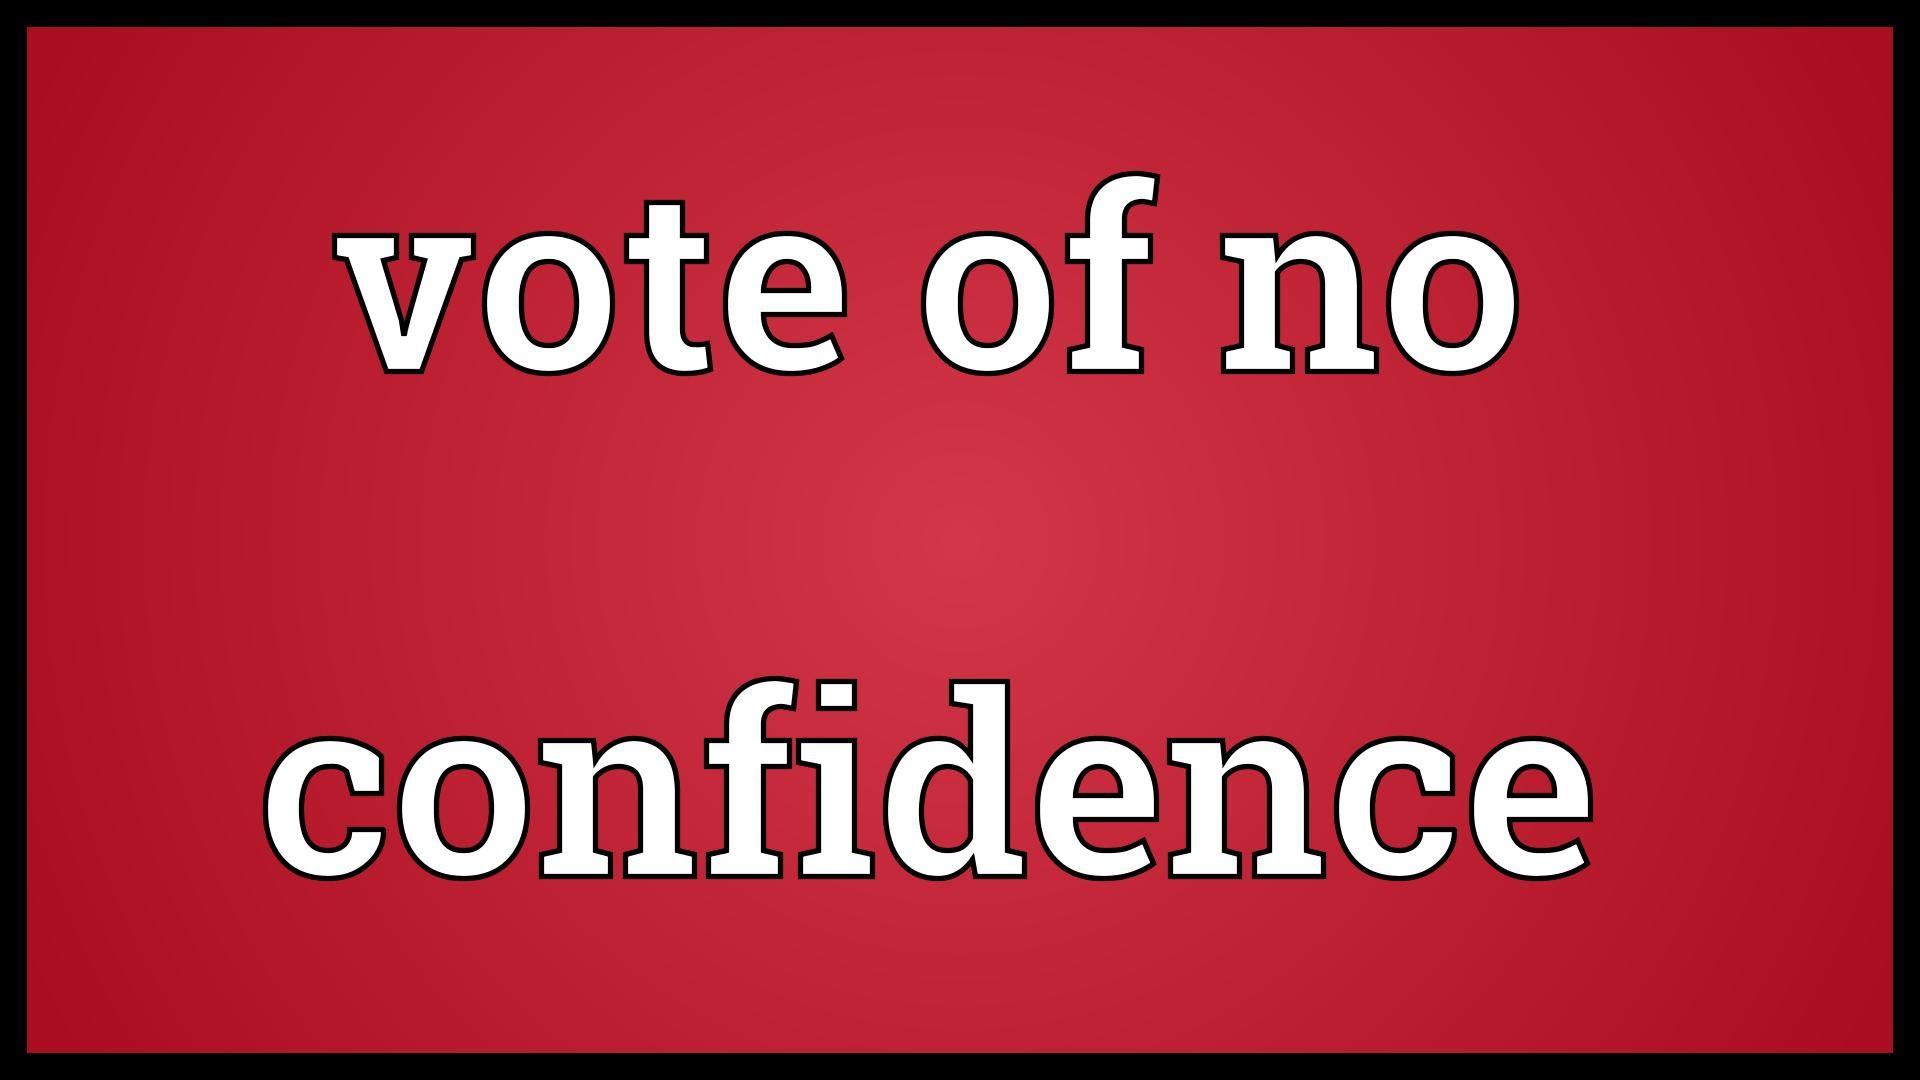 Waverley Leader advised of No Confidence Vote